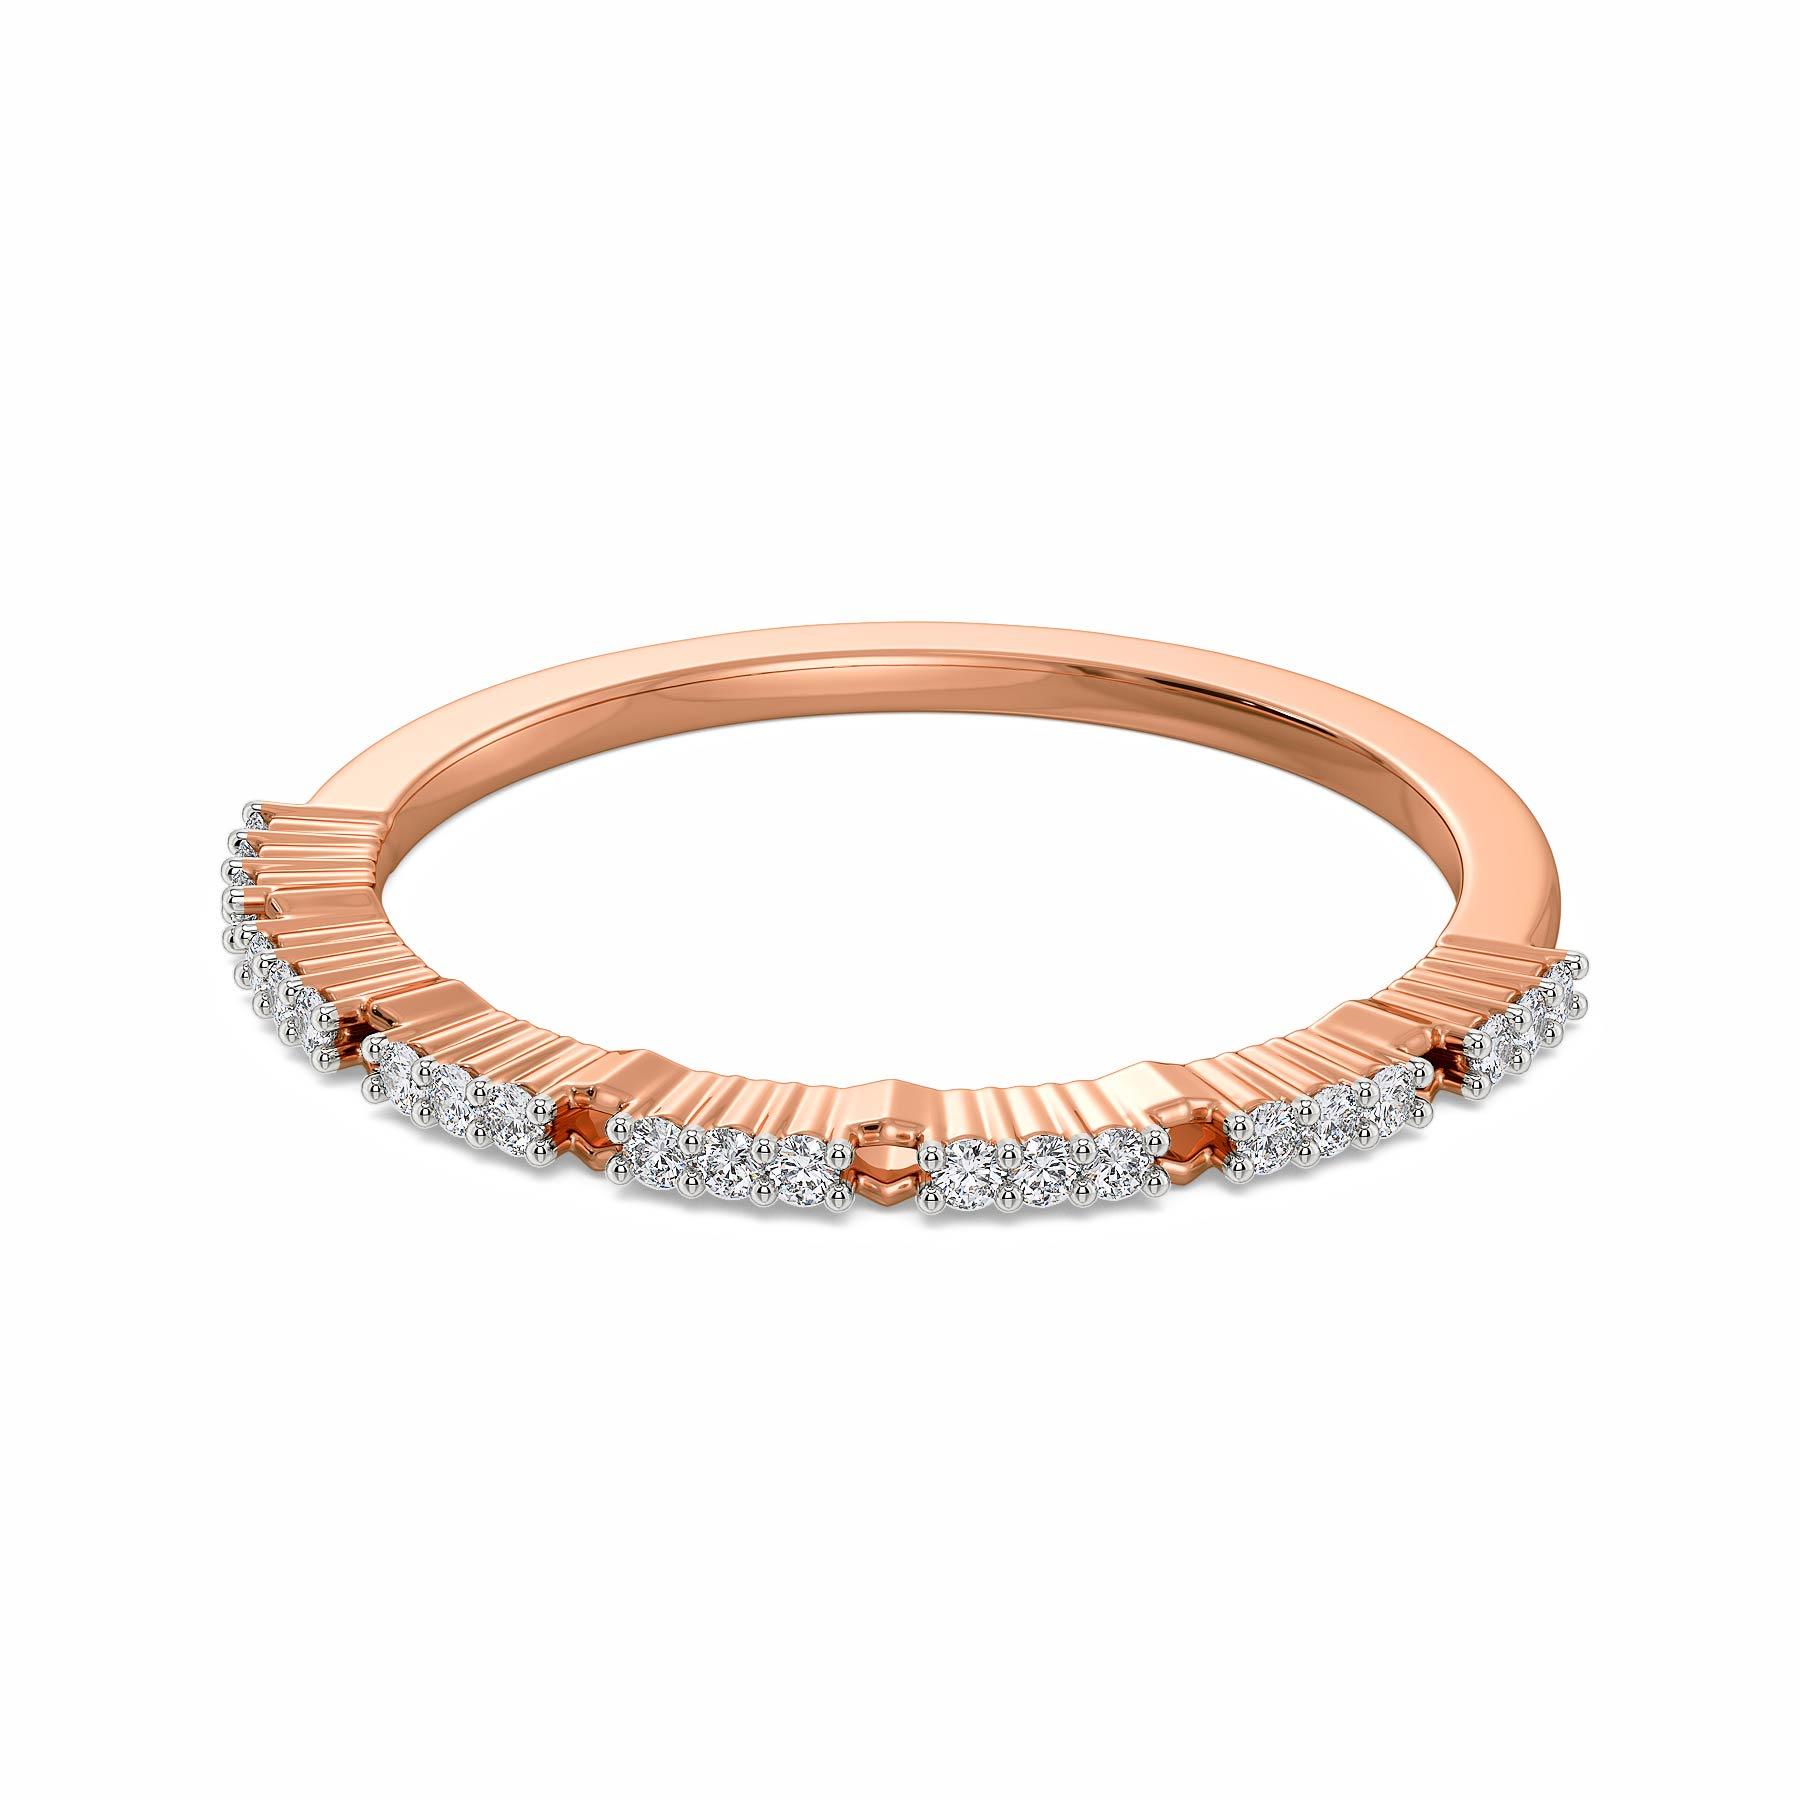 Blush Crush Diamond Rings